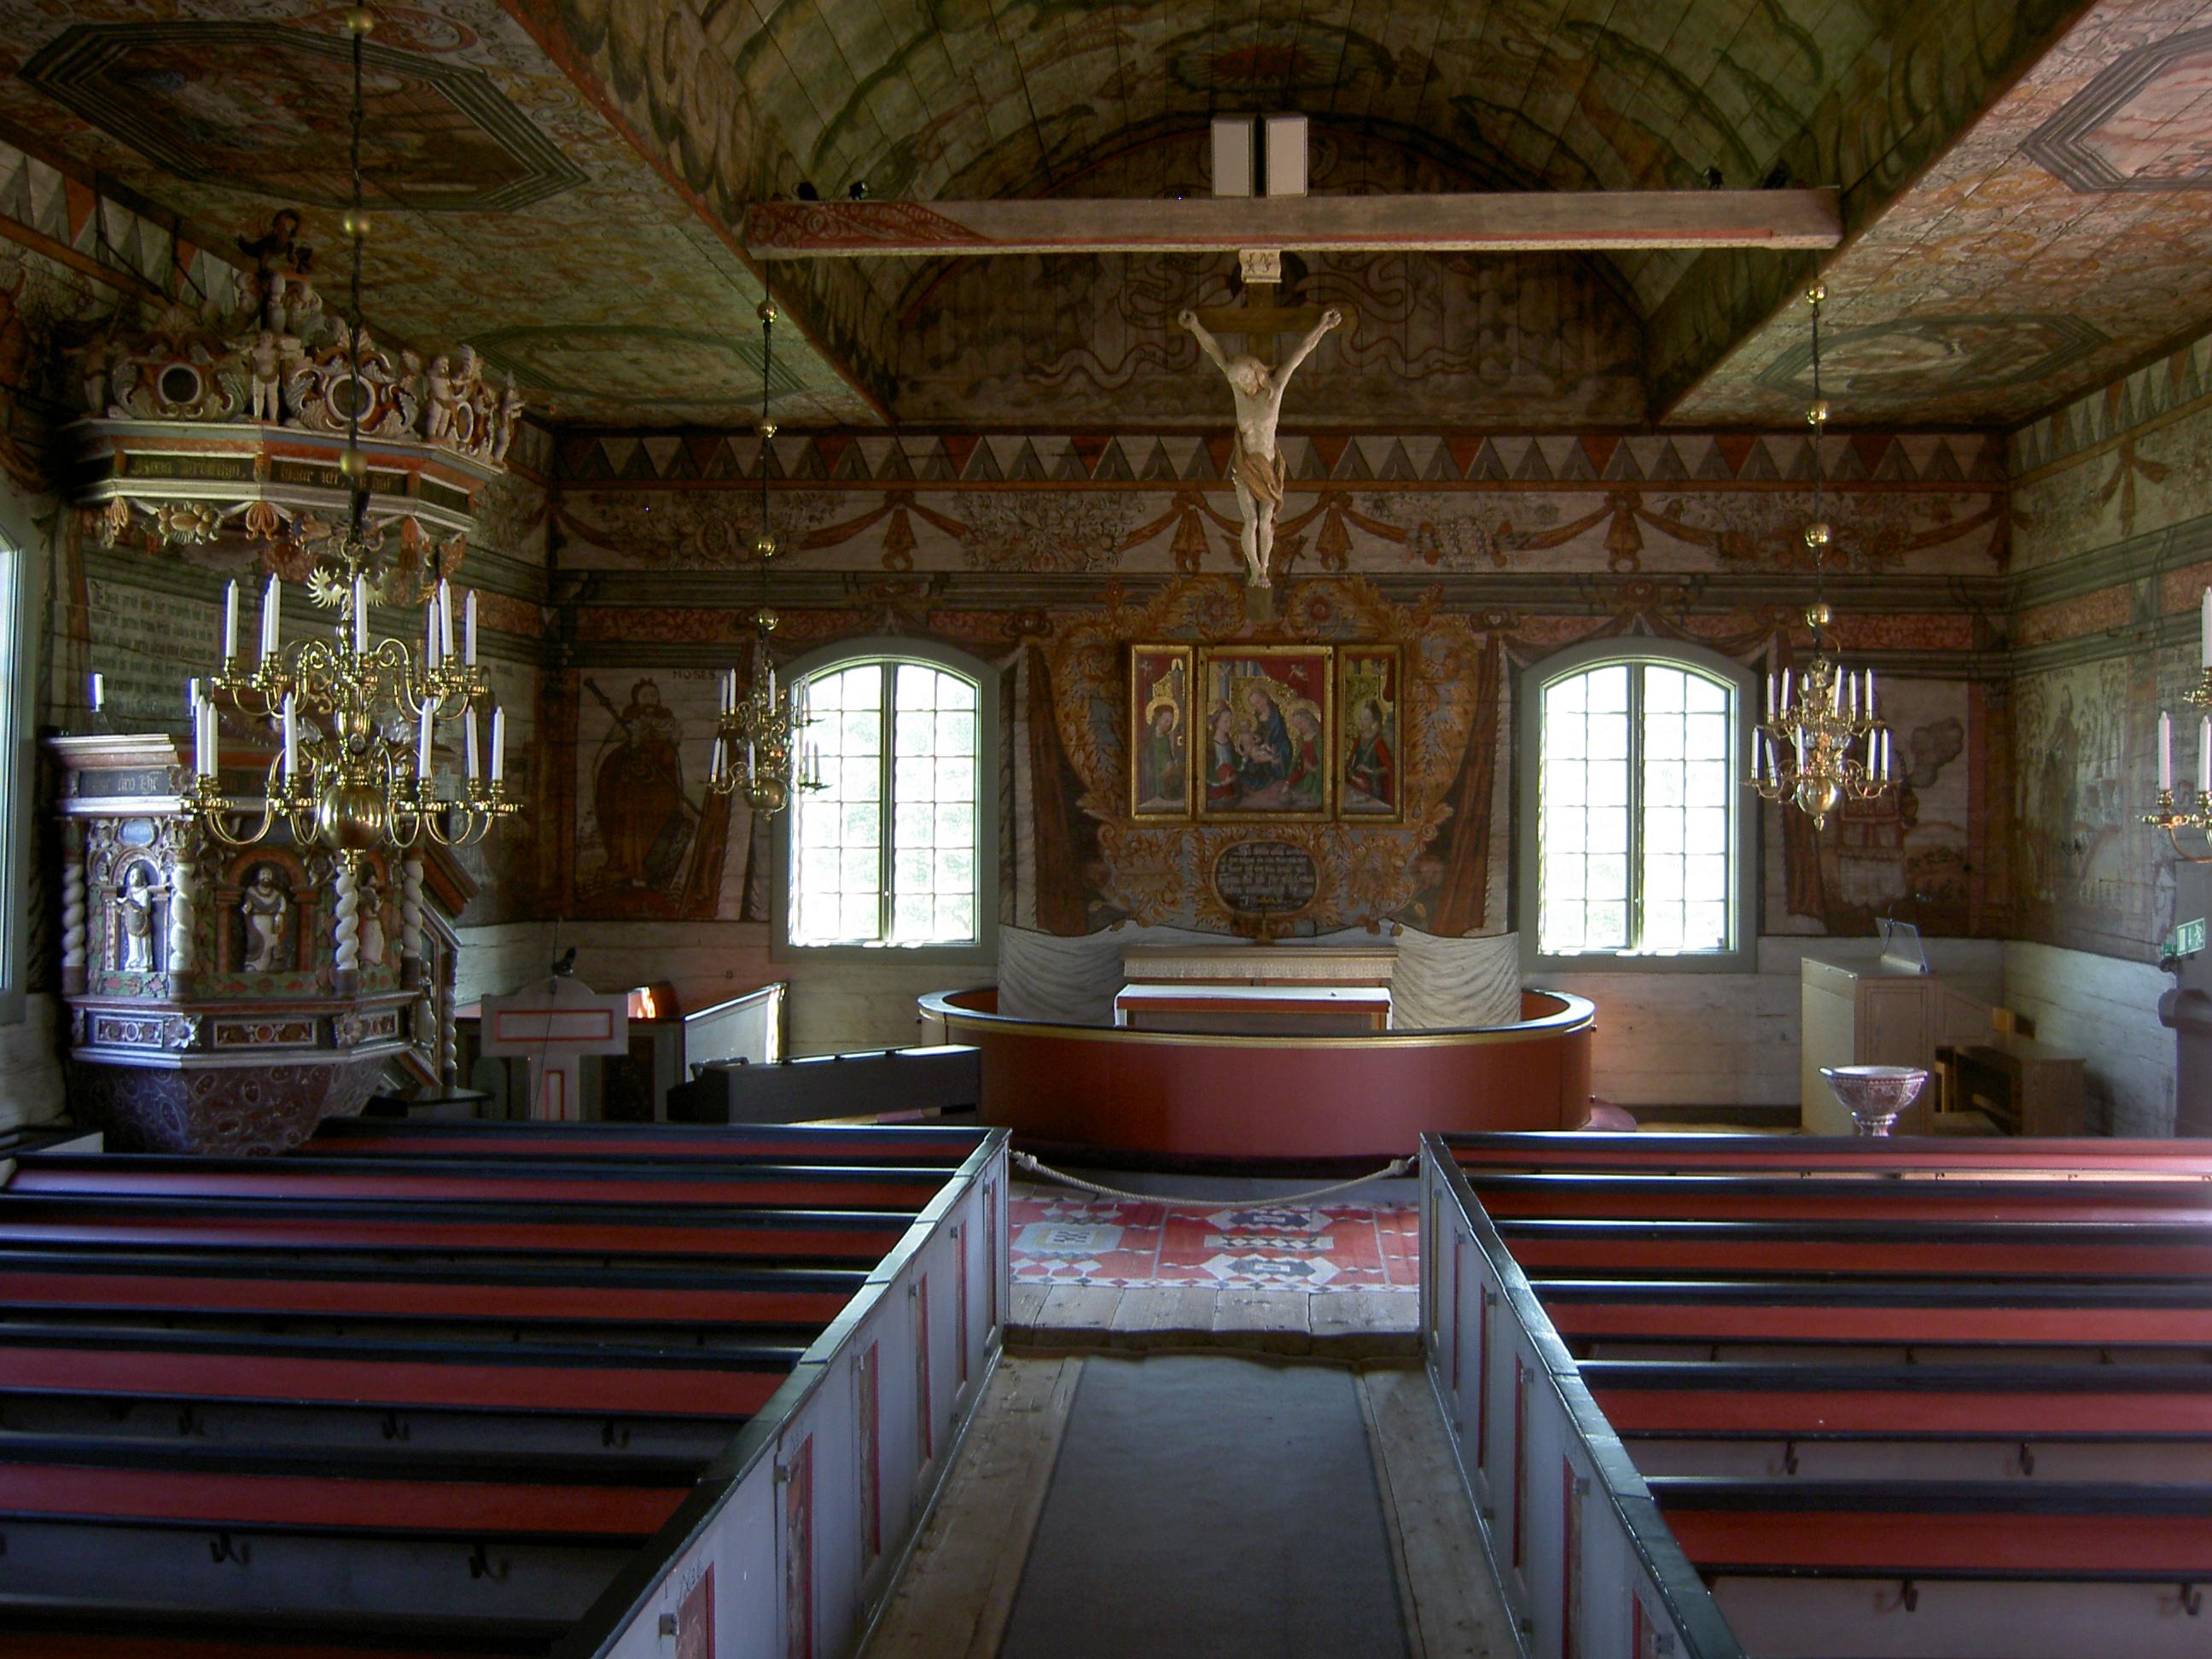 Djursdala church (interior)